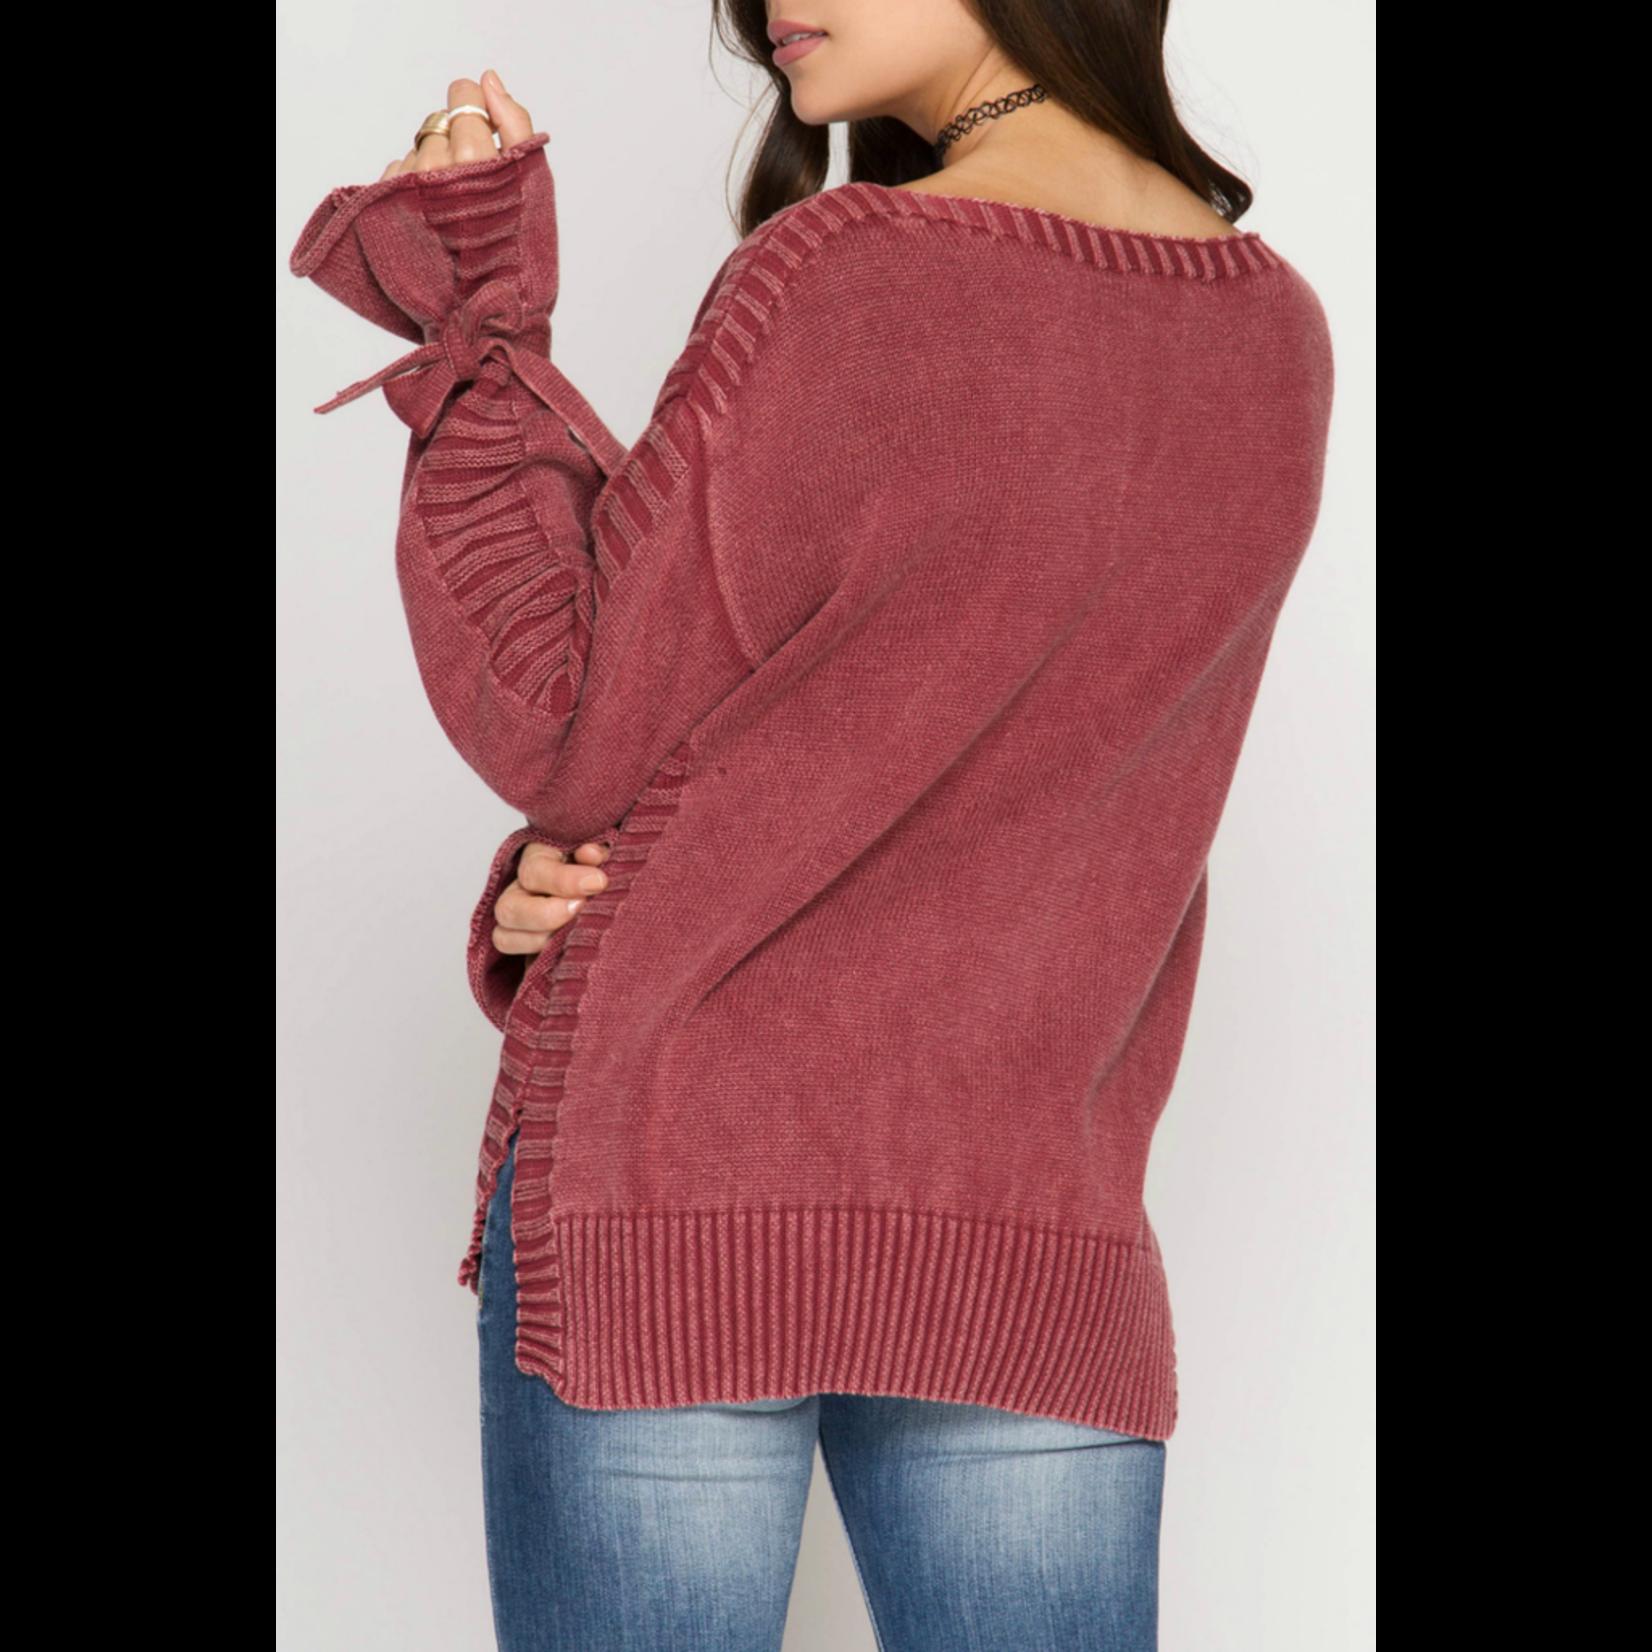 She & Sky Sleeve Tie Sweater, sale item, Was $59.  Now $41.30